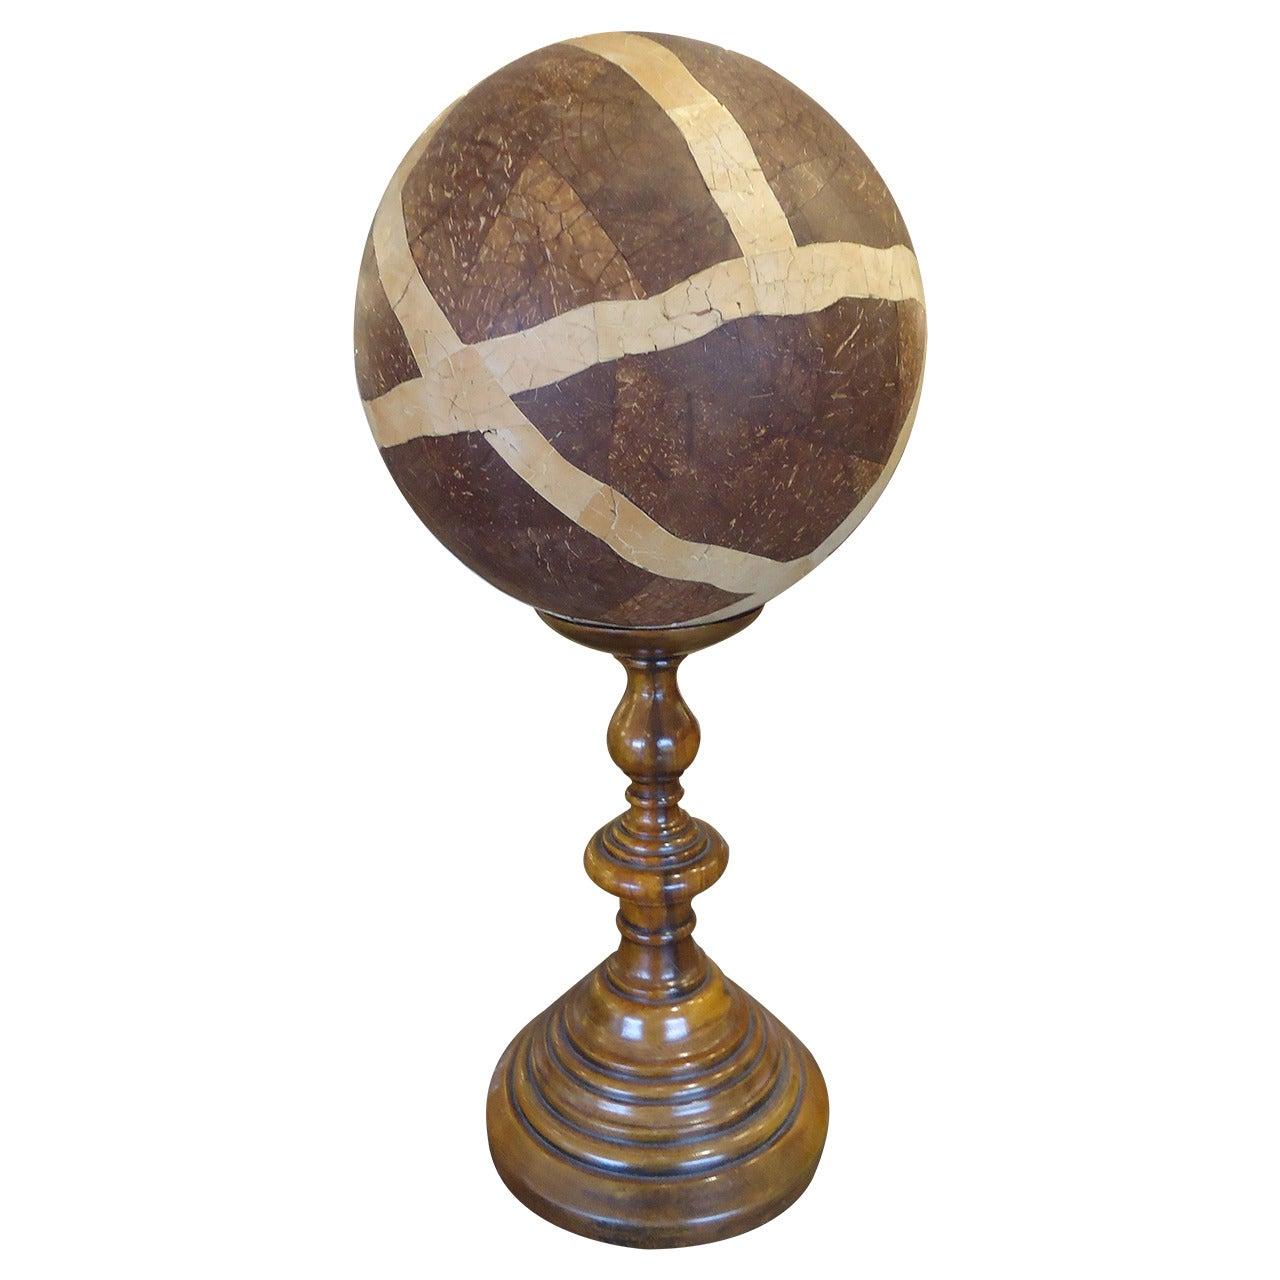 Masculine Wooden Orb/Globe on Custom Stand